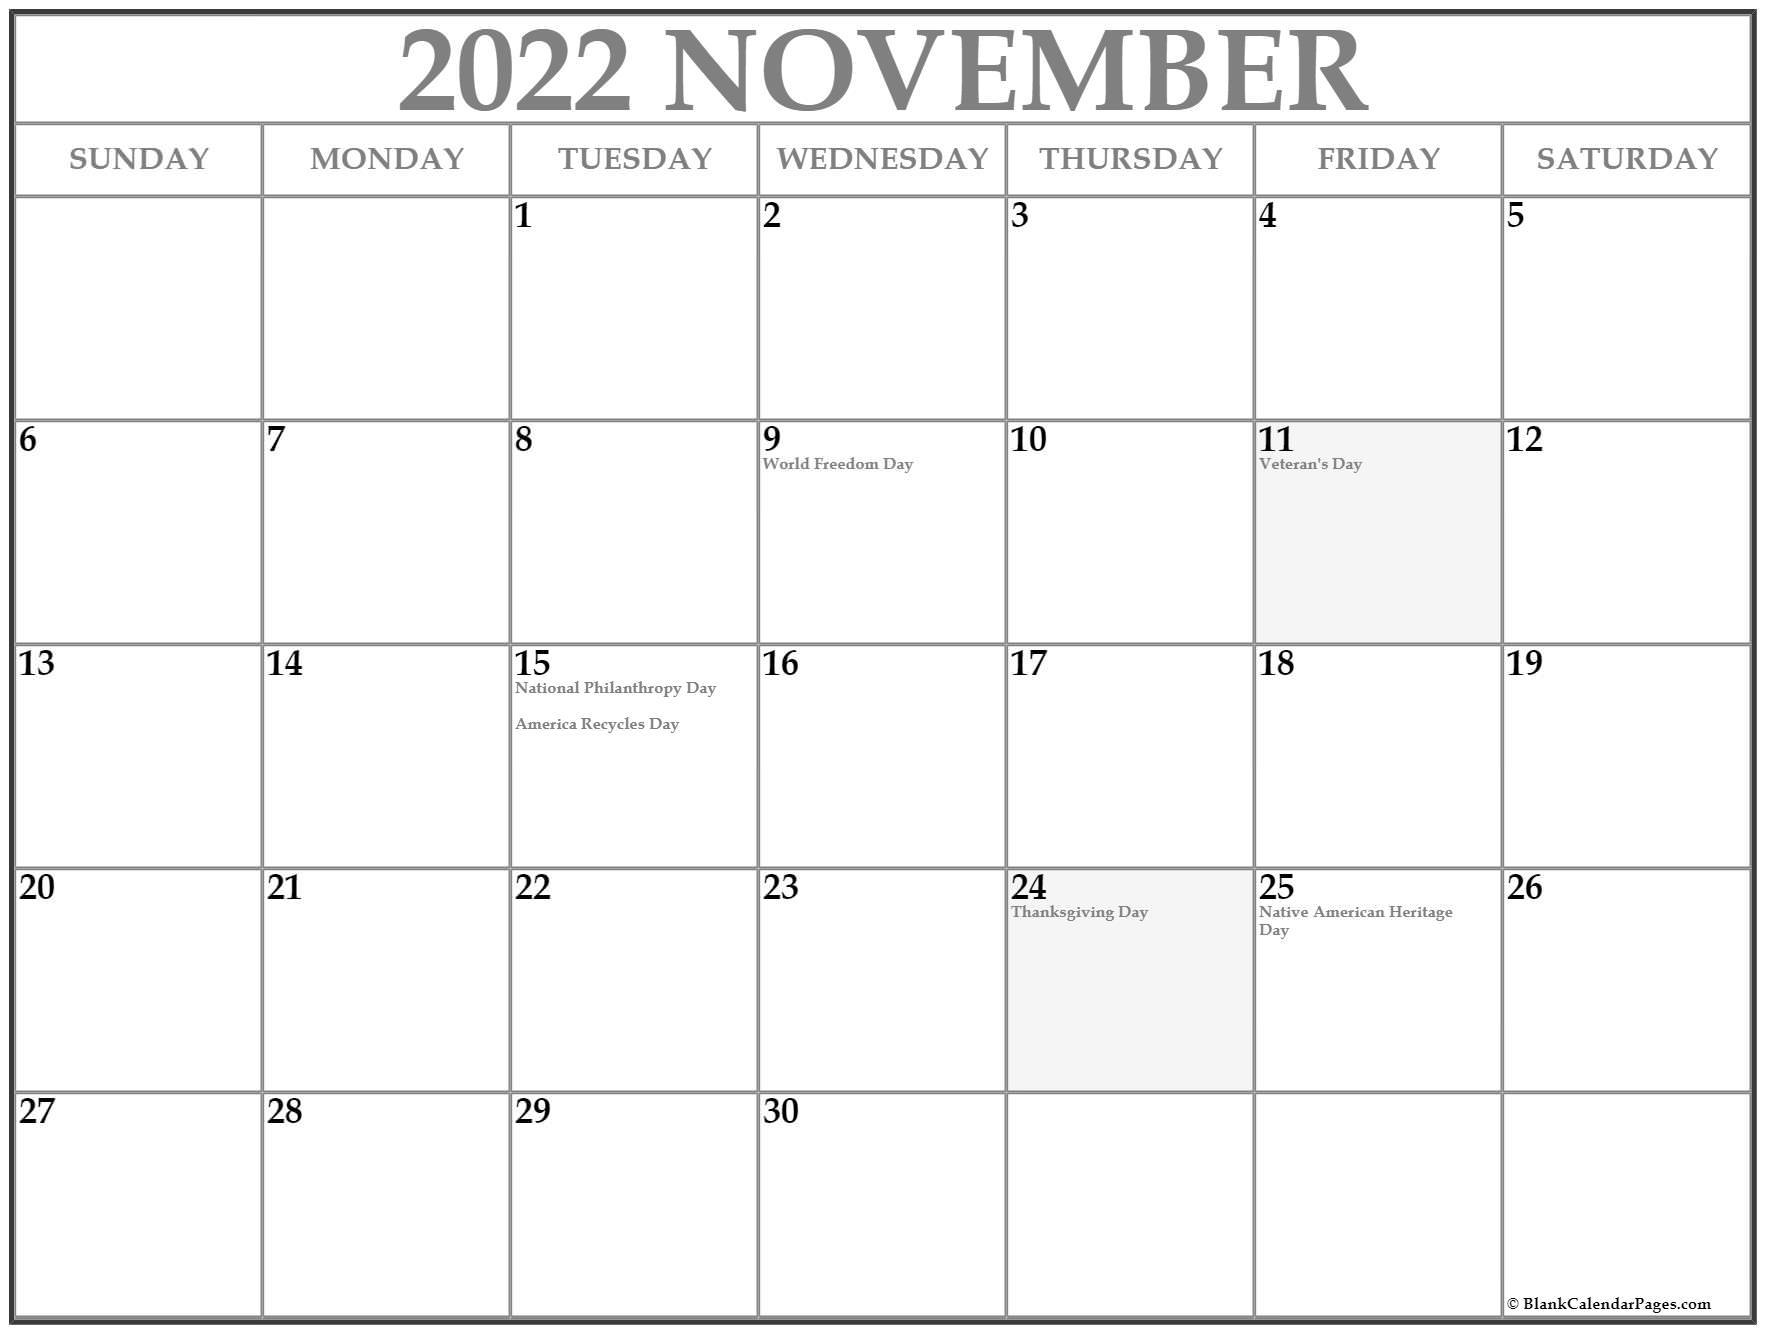 November 2020 Calendar With Holidays Usa Collection of November 2020 calendars with holidays